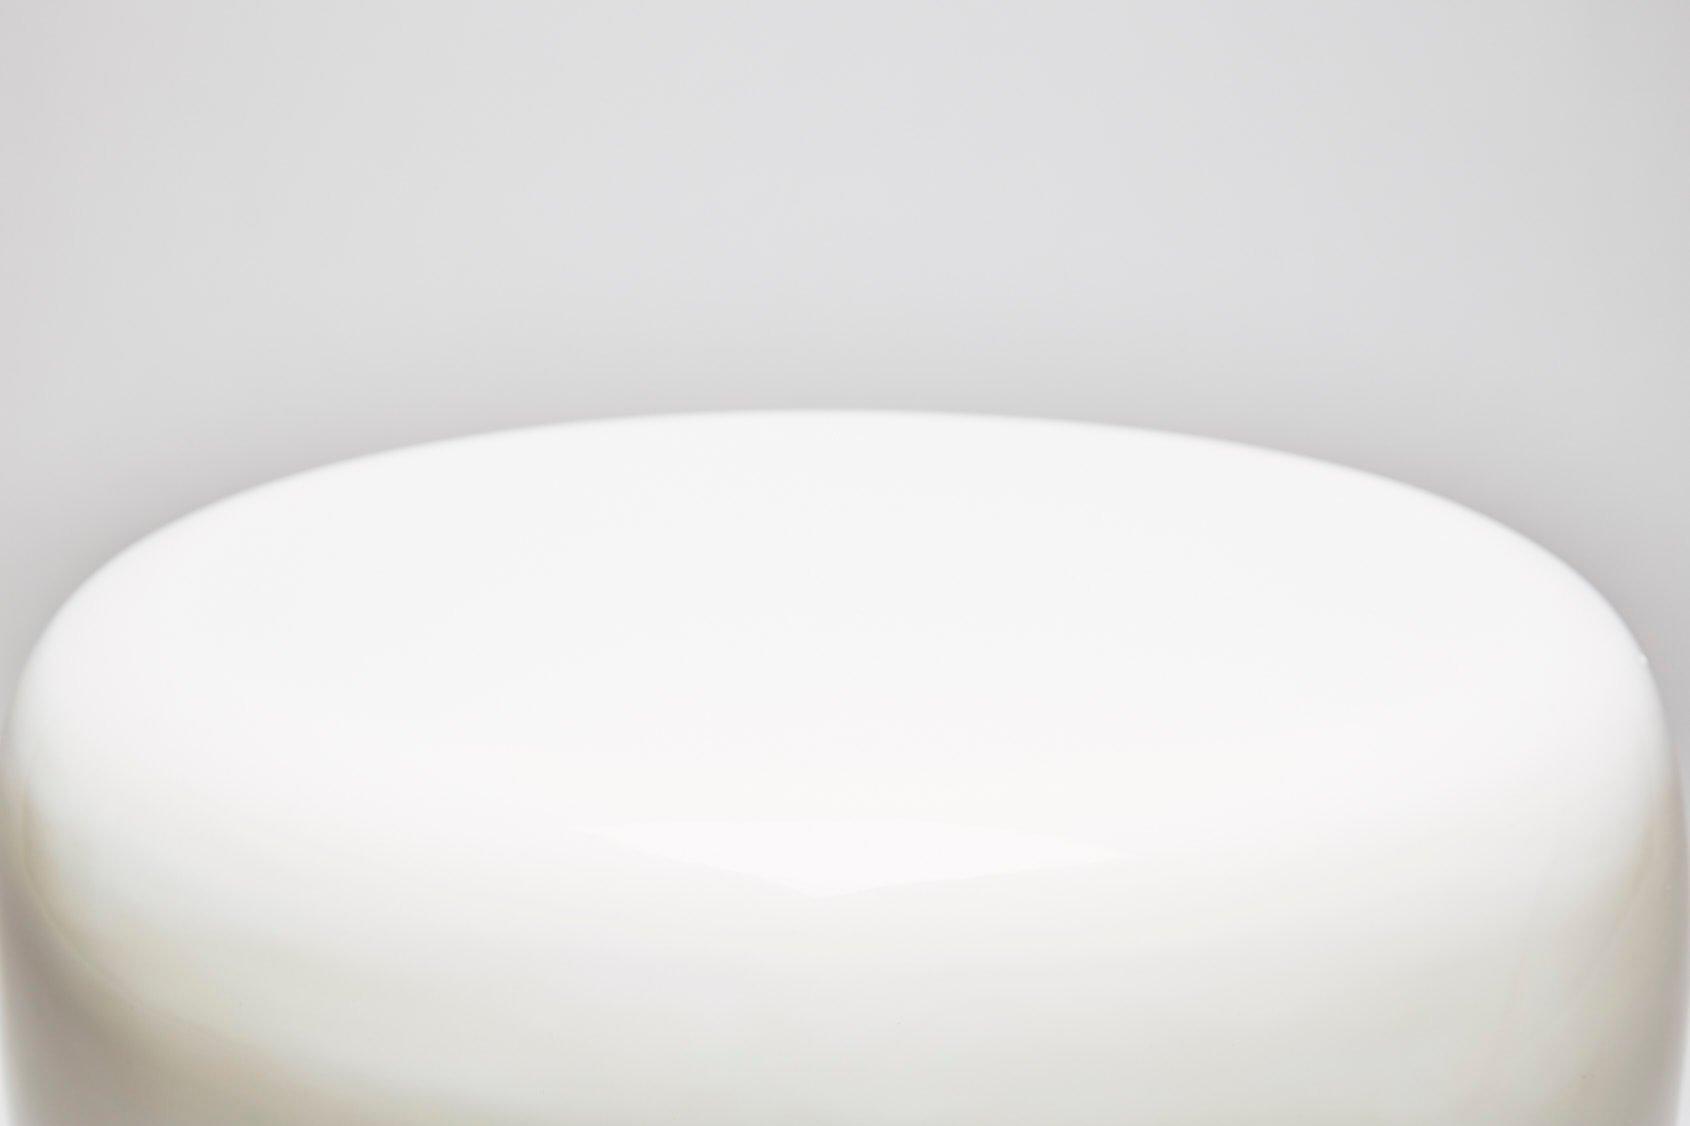 Tavolino o sgabello dot bianco latte di reda amalou in vendita su pamono